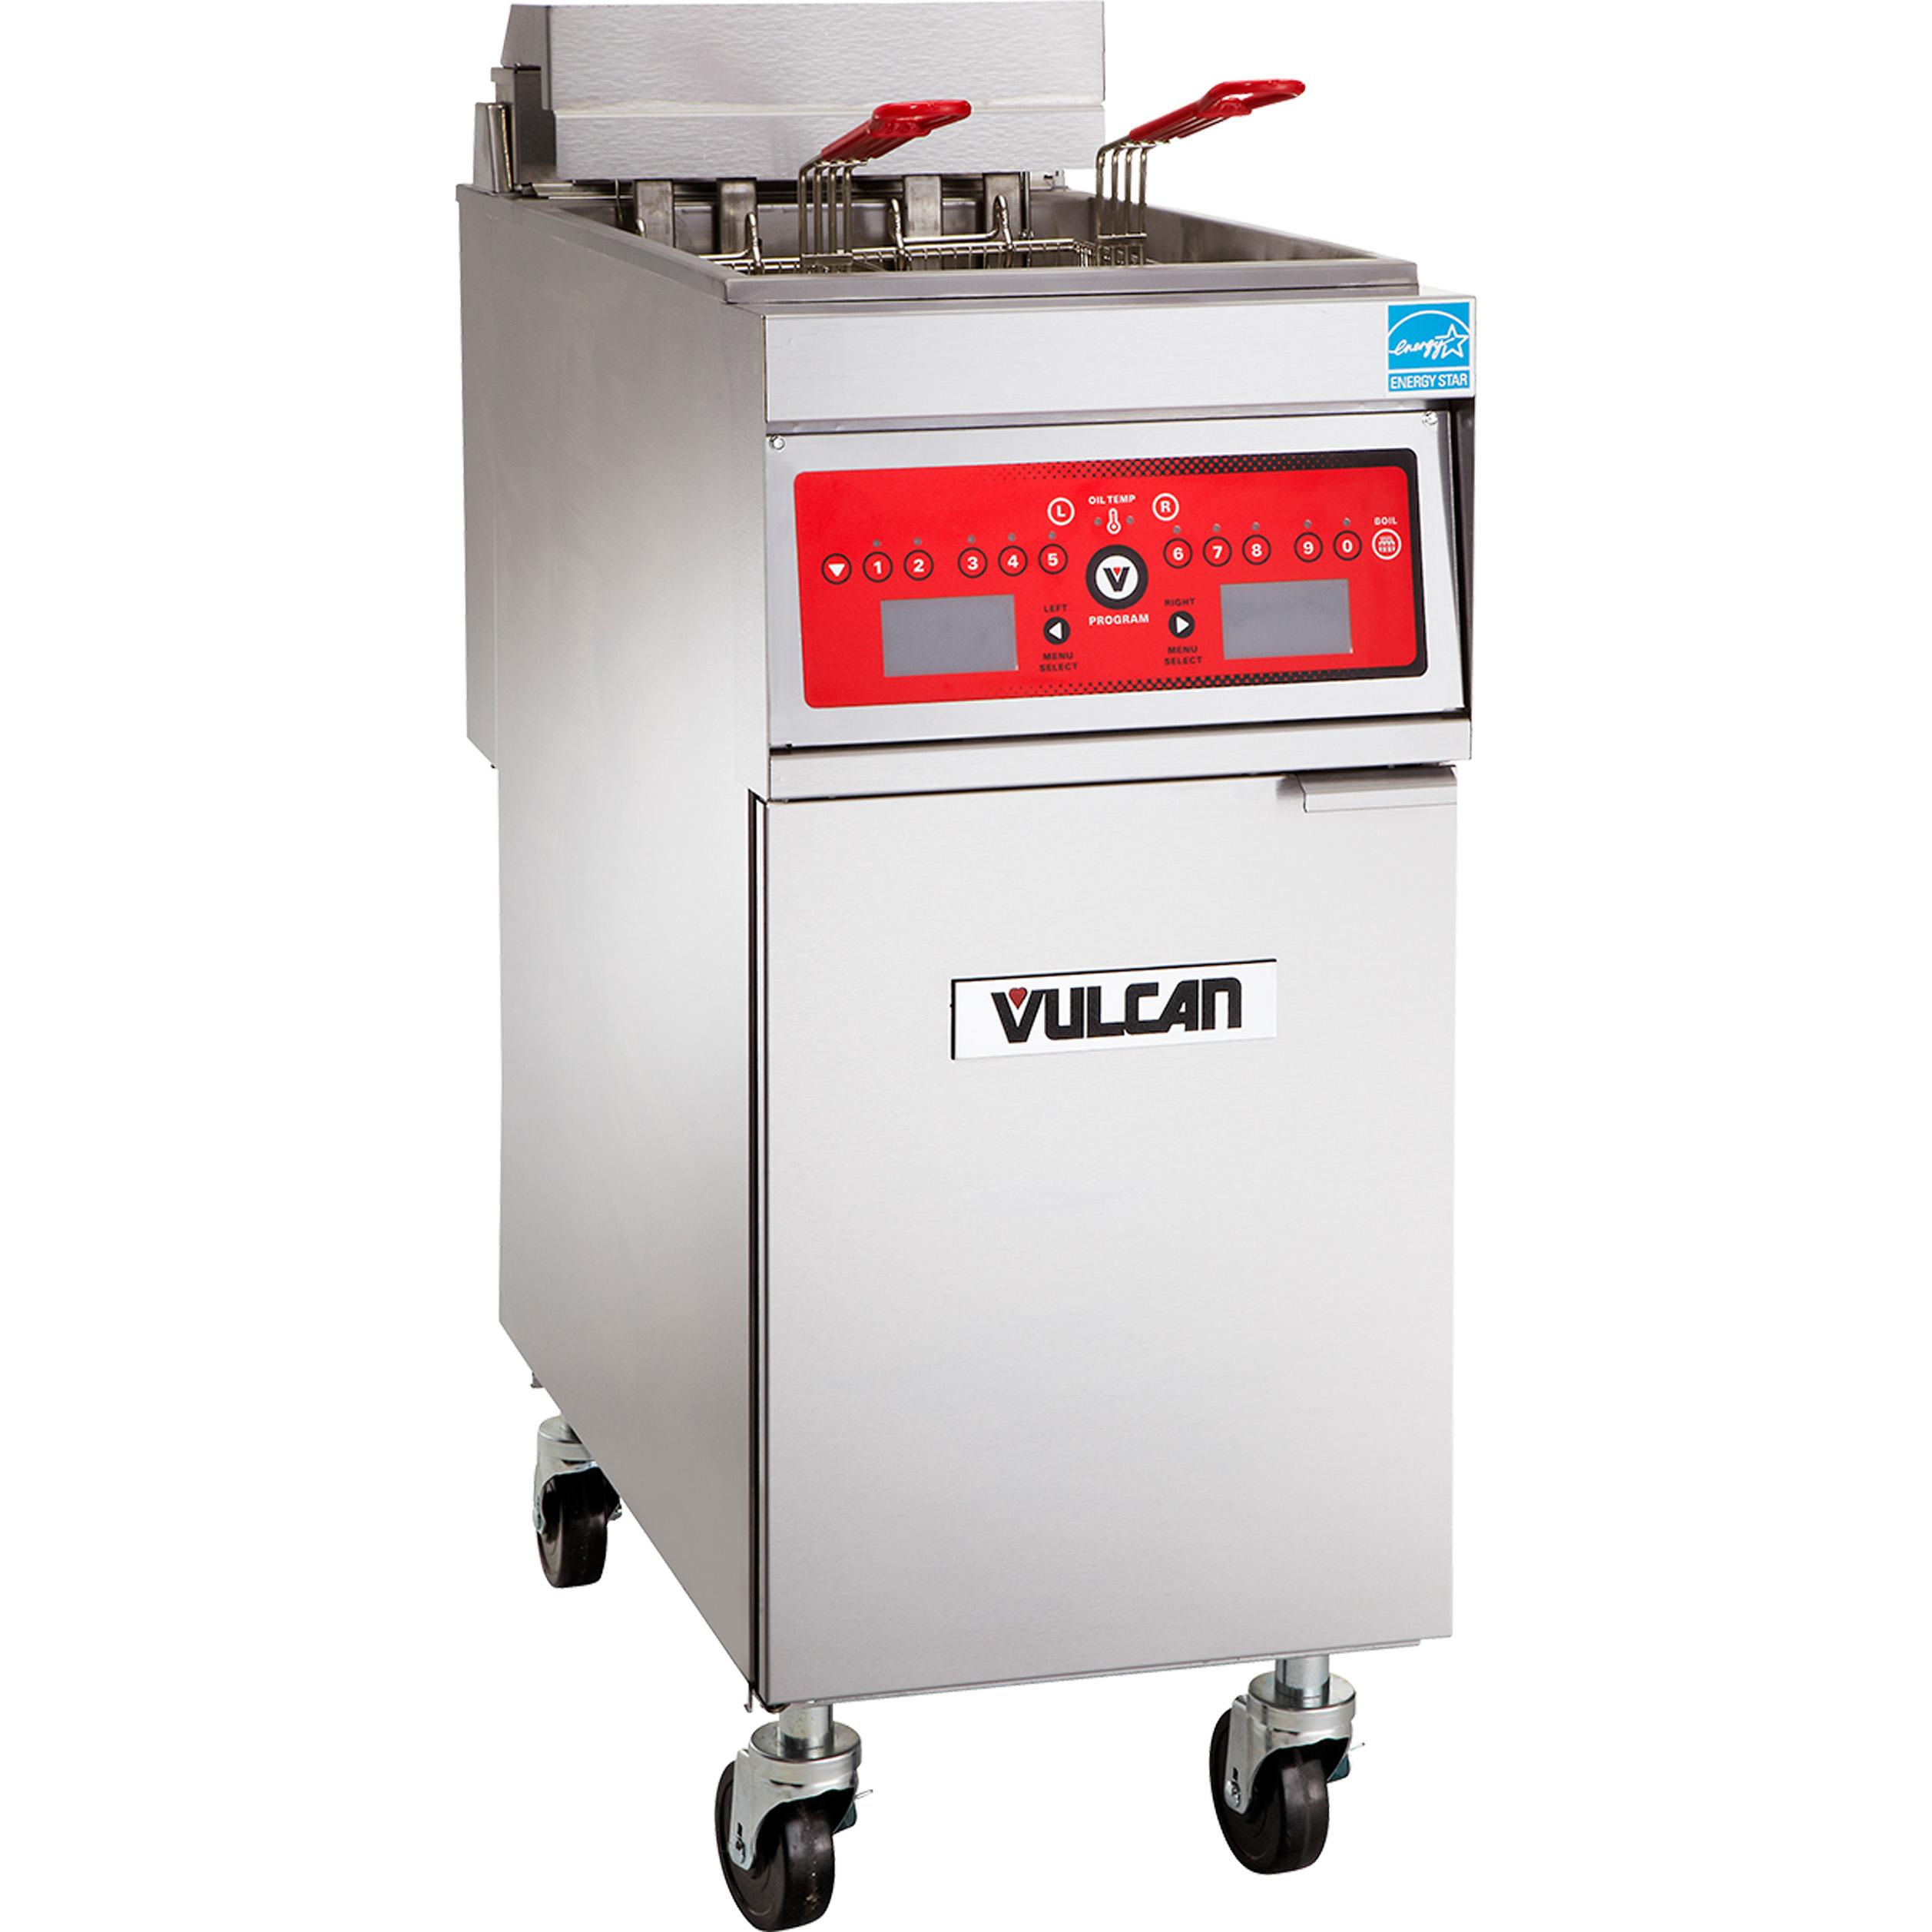 Vulcan 1ER85DF-1 fryer, electric, floor model, full pot